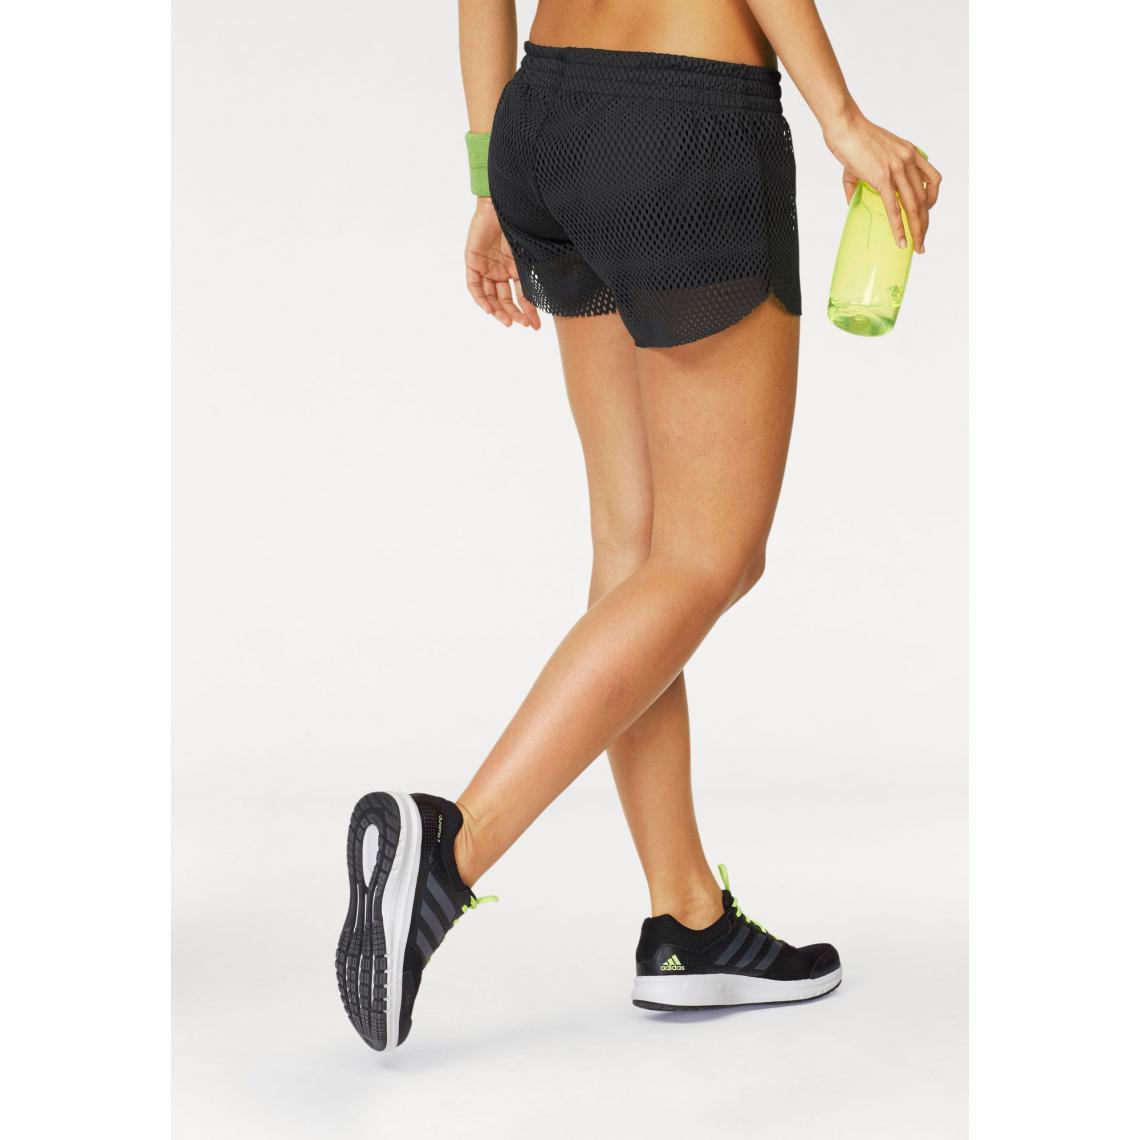 Short femme 2 en 1 Mesh adidas Performance - Noir  78fba901156